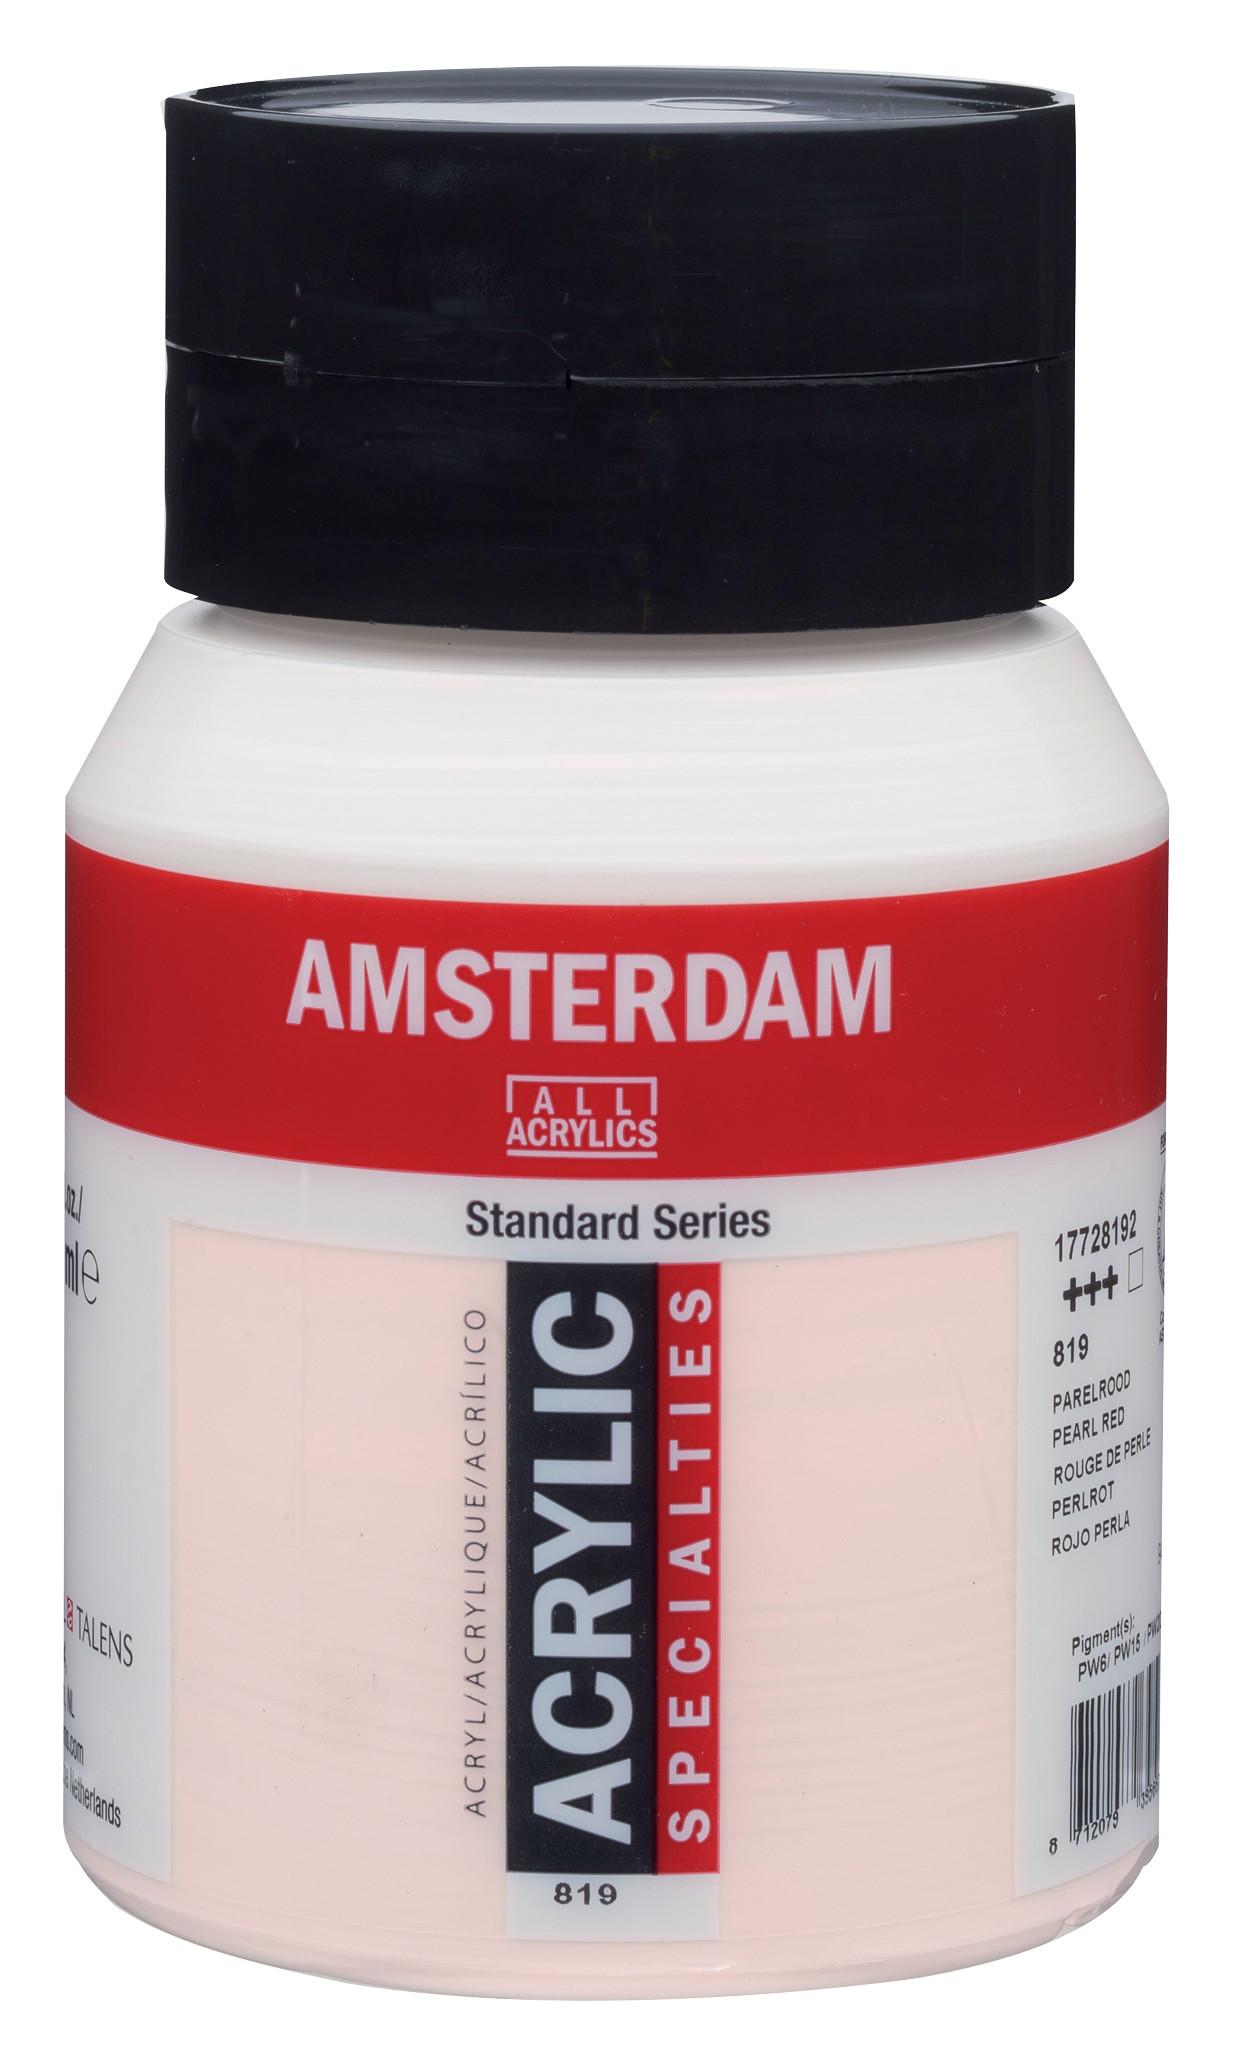 Amsterdam Standard Series Acrylic Jar 500 ml Pearl red 819